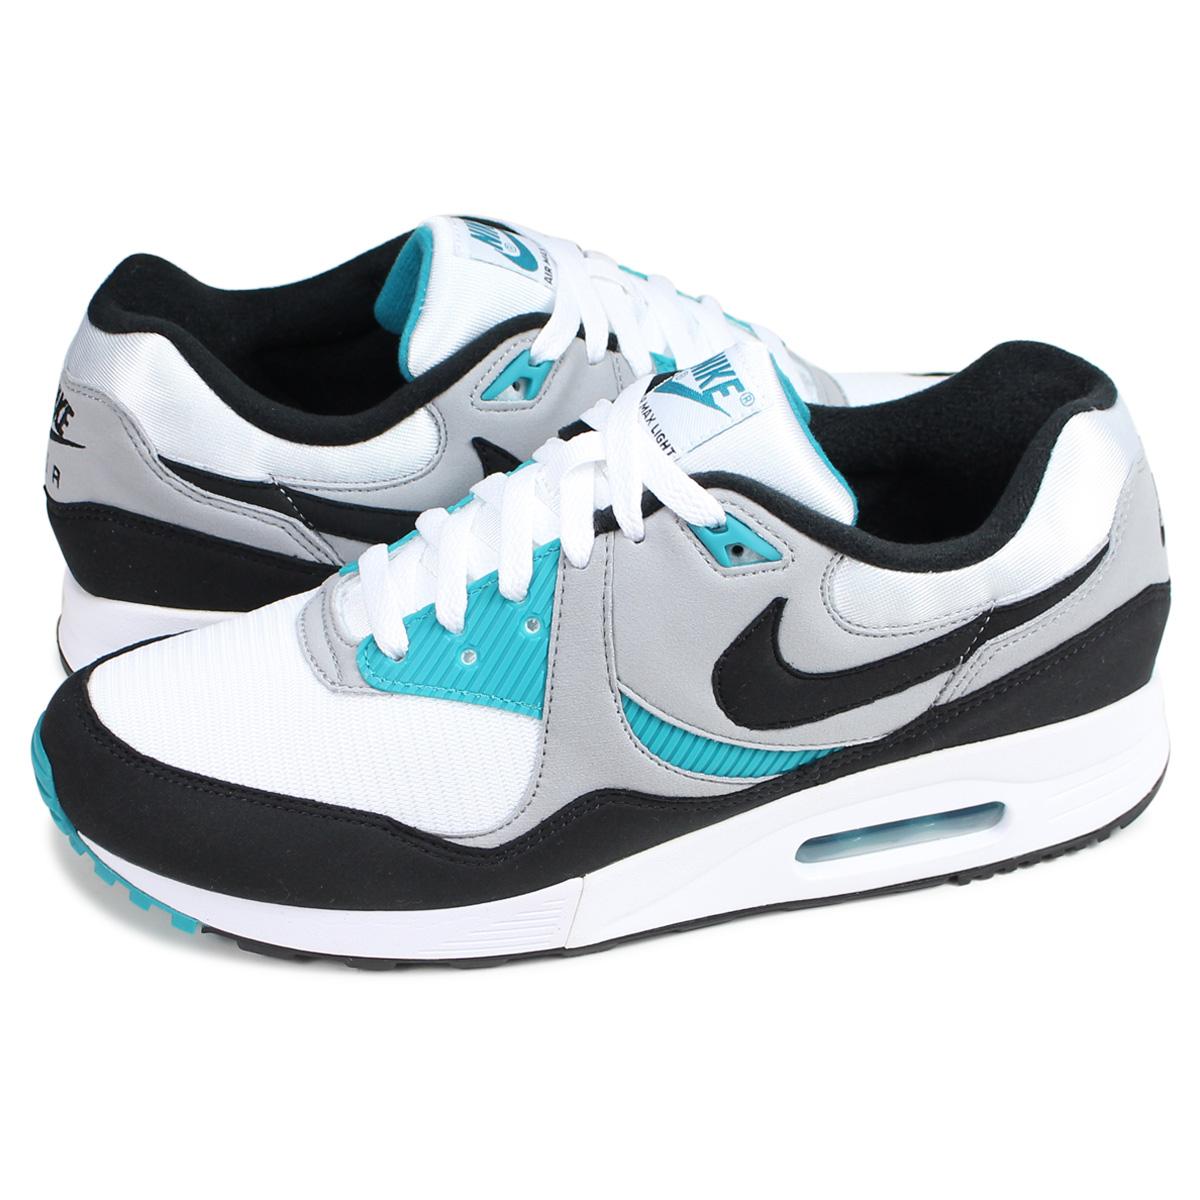 Nike NIKE Air Max light sneakers men AIR MAX LIGHT white white AO8285 103 [196]